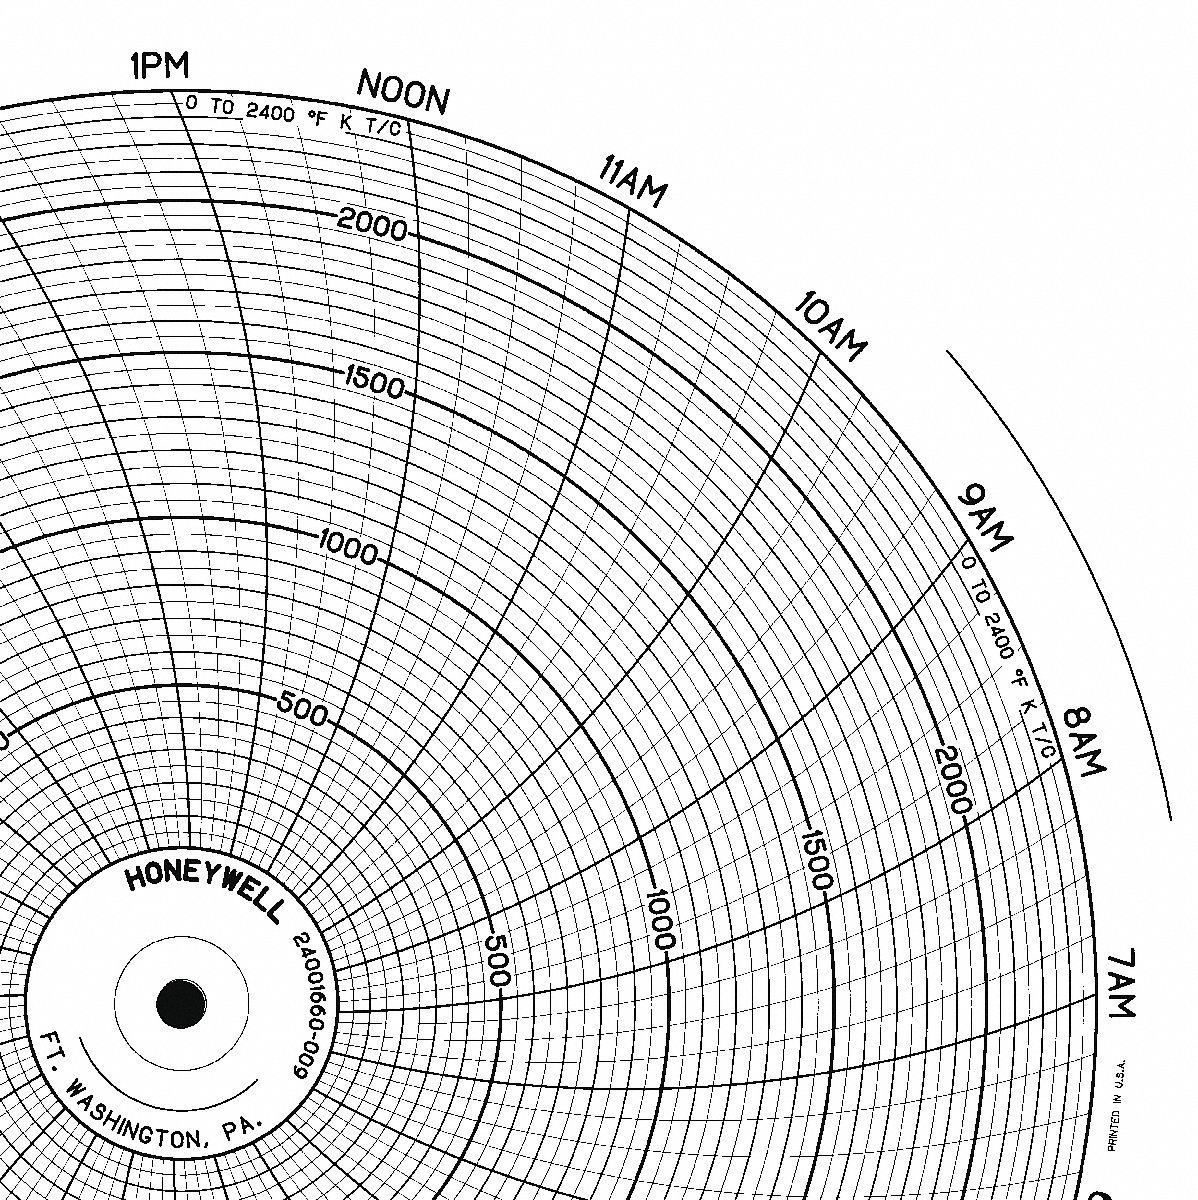 HONEYWELL Chart, 10.313 In, 0 to 2400, 1 Day, PK100